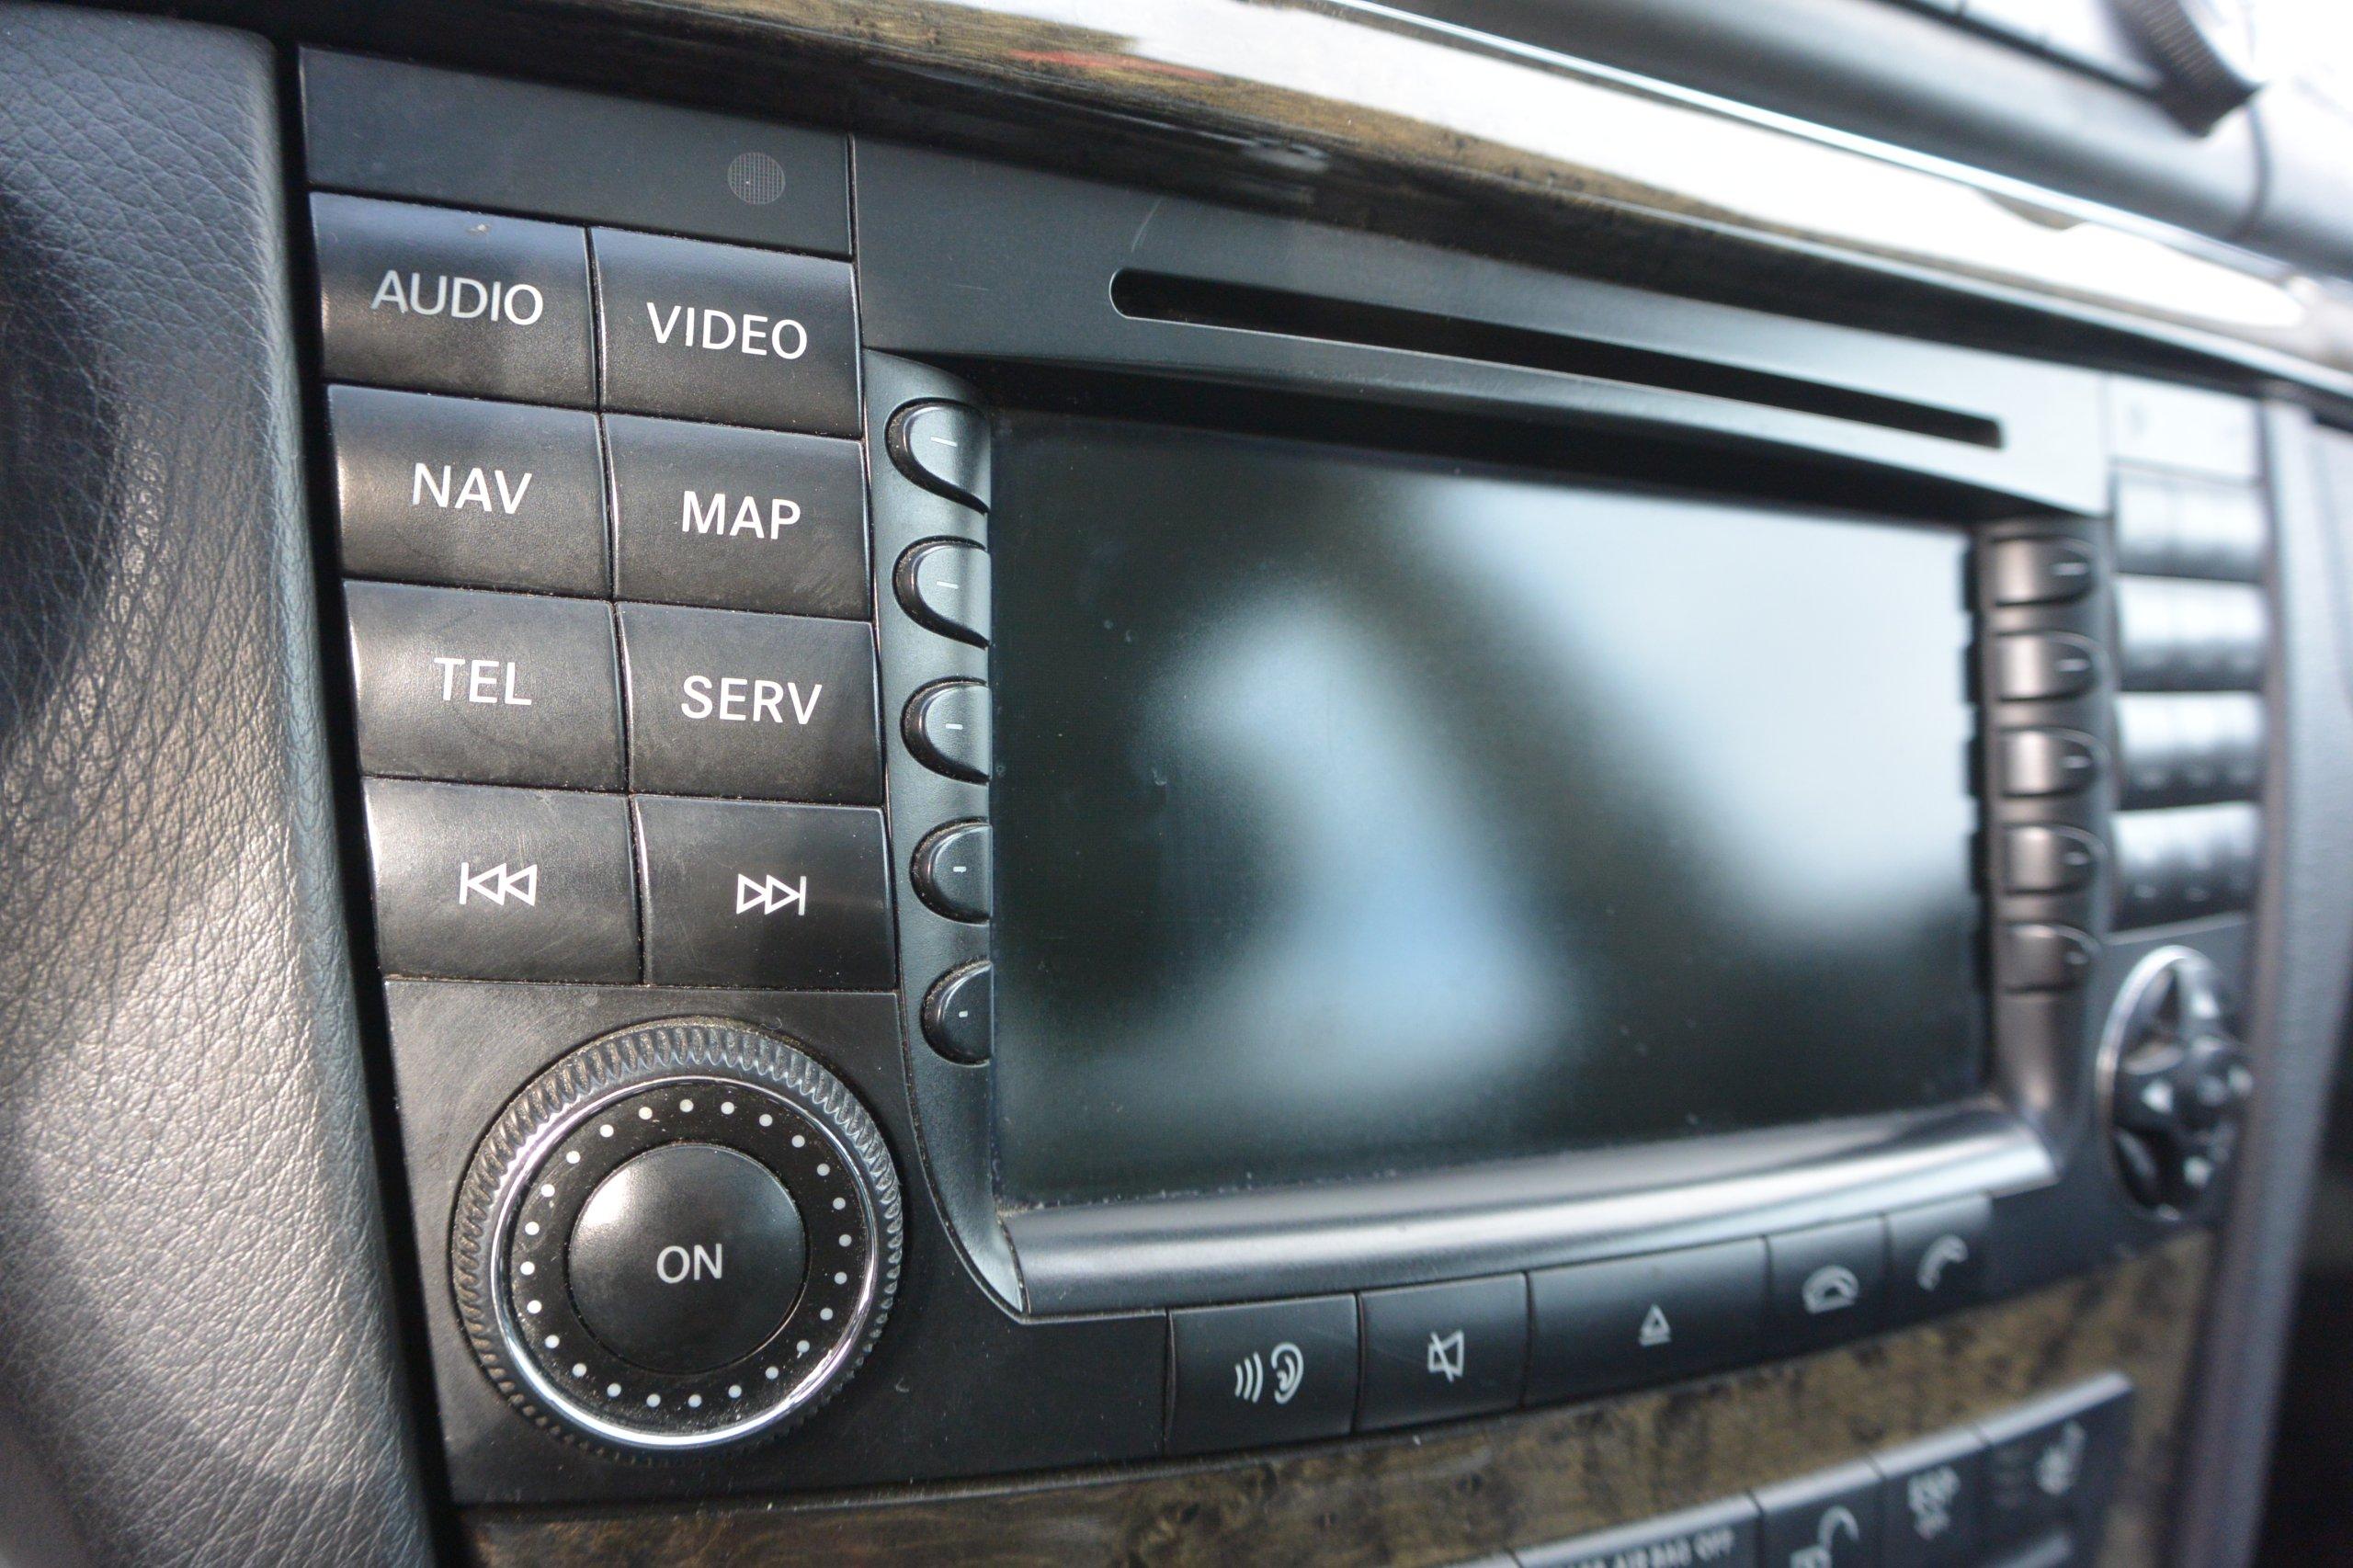 radio fabryczne navi comand dvd w211 mercedes 7173259139. Black Bedroom Furniture Sets. Home Design Ideas